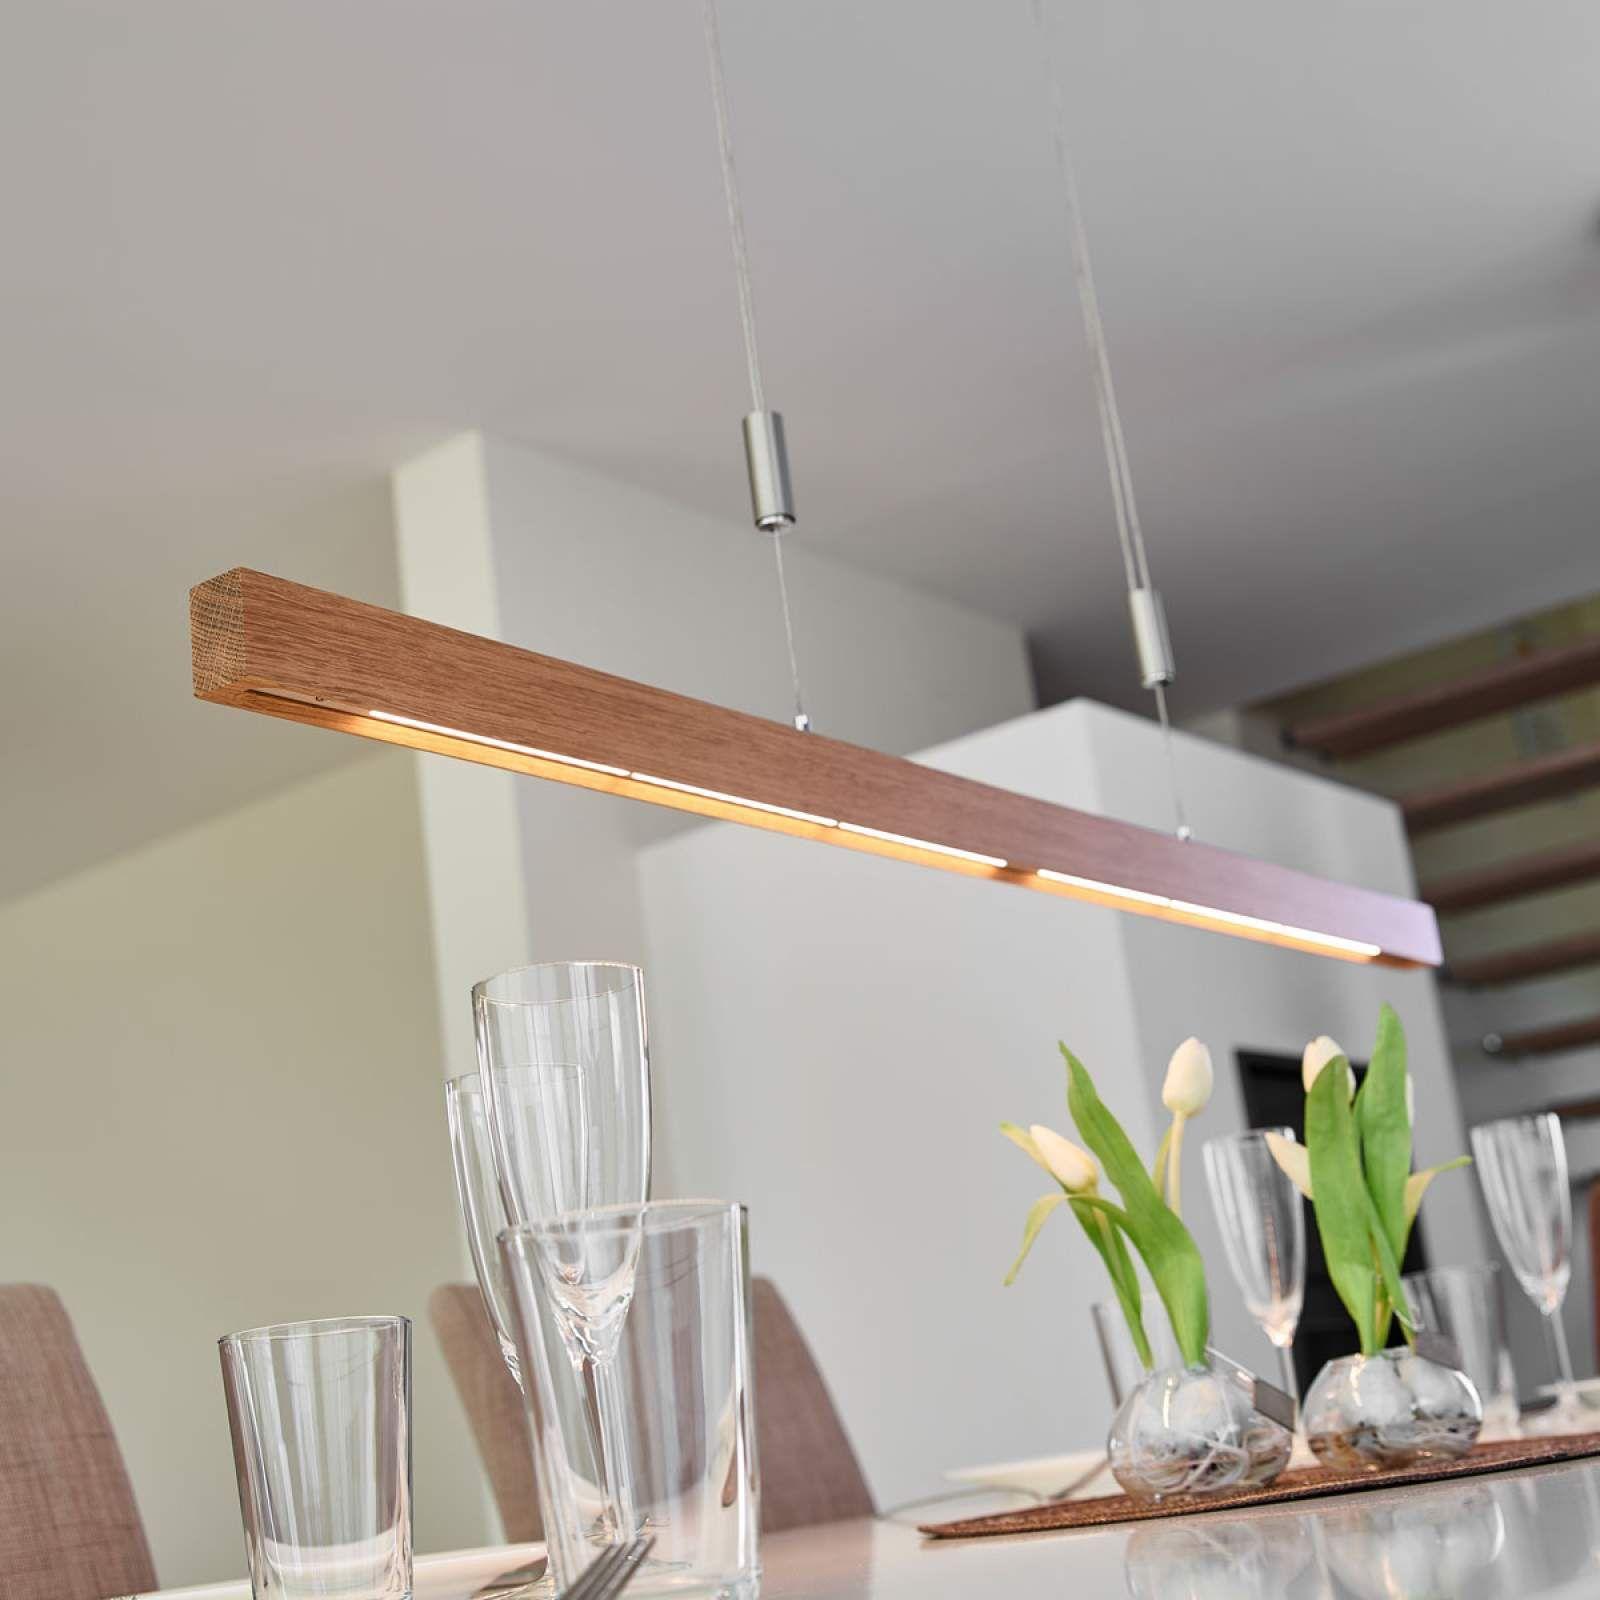 Eichenholz LED Balkenpendellampe Nora dimmbar | Eiche holz